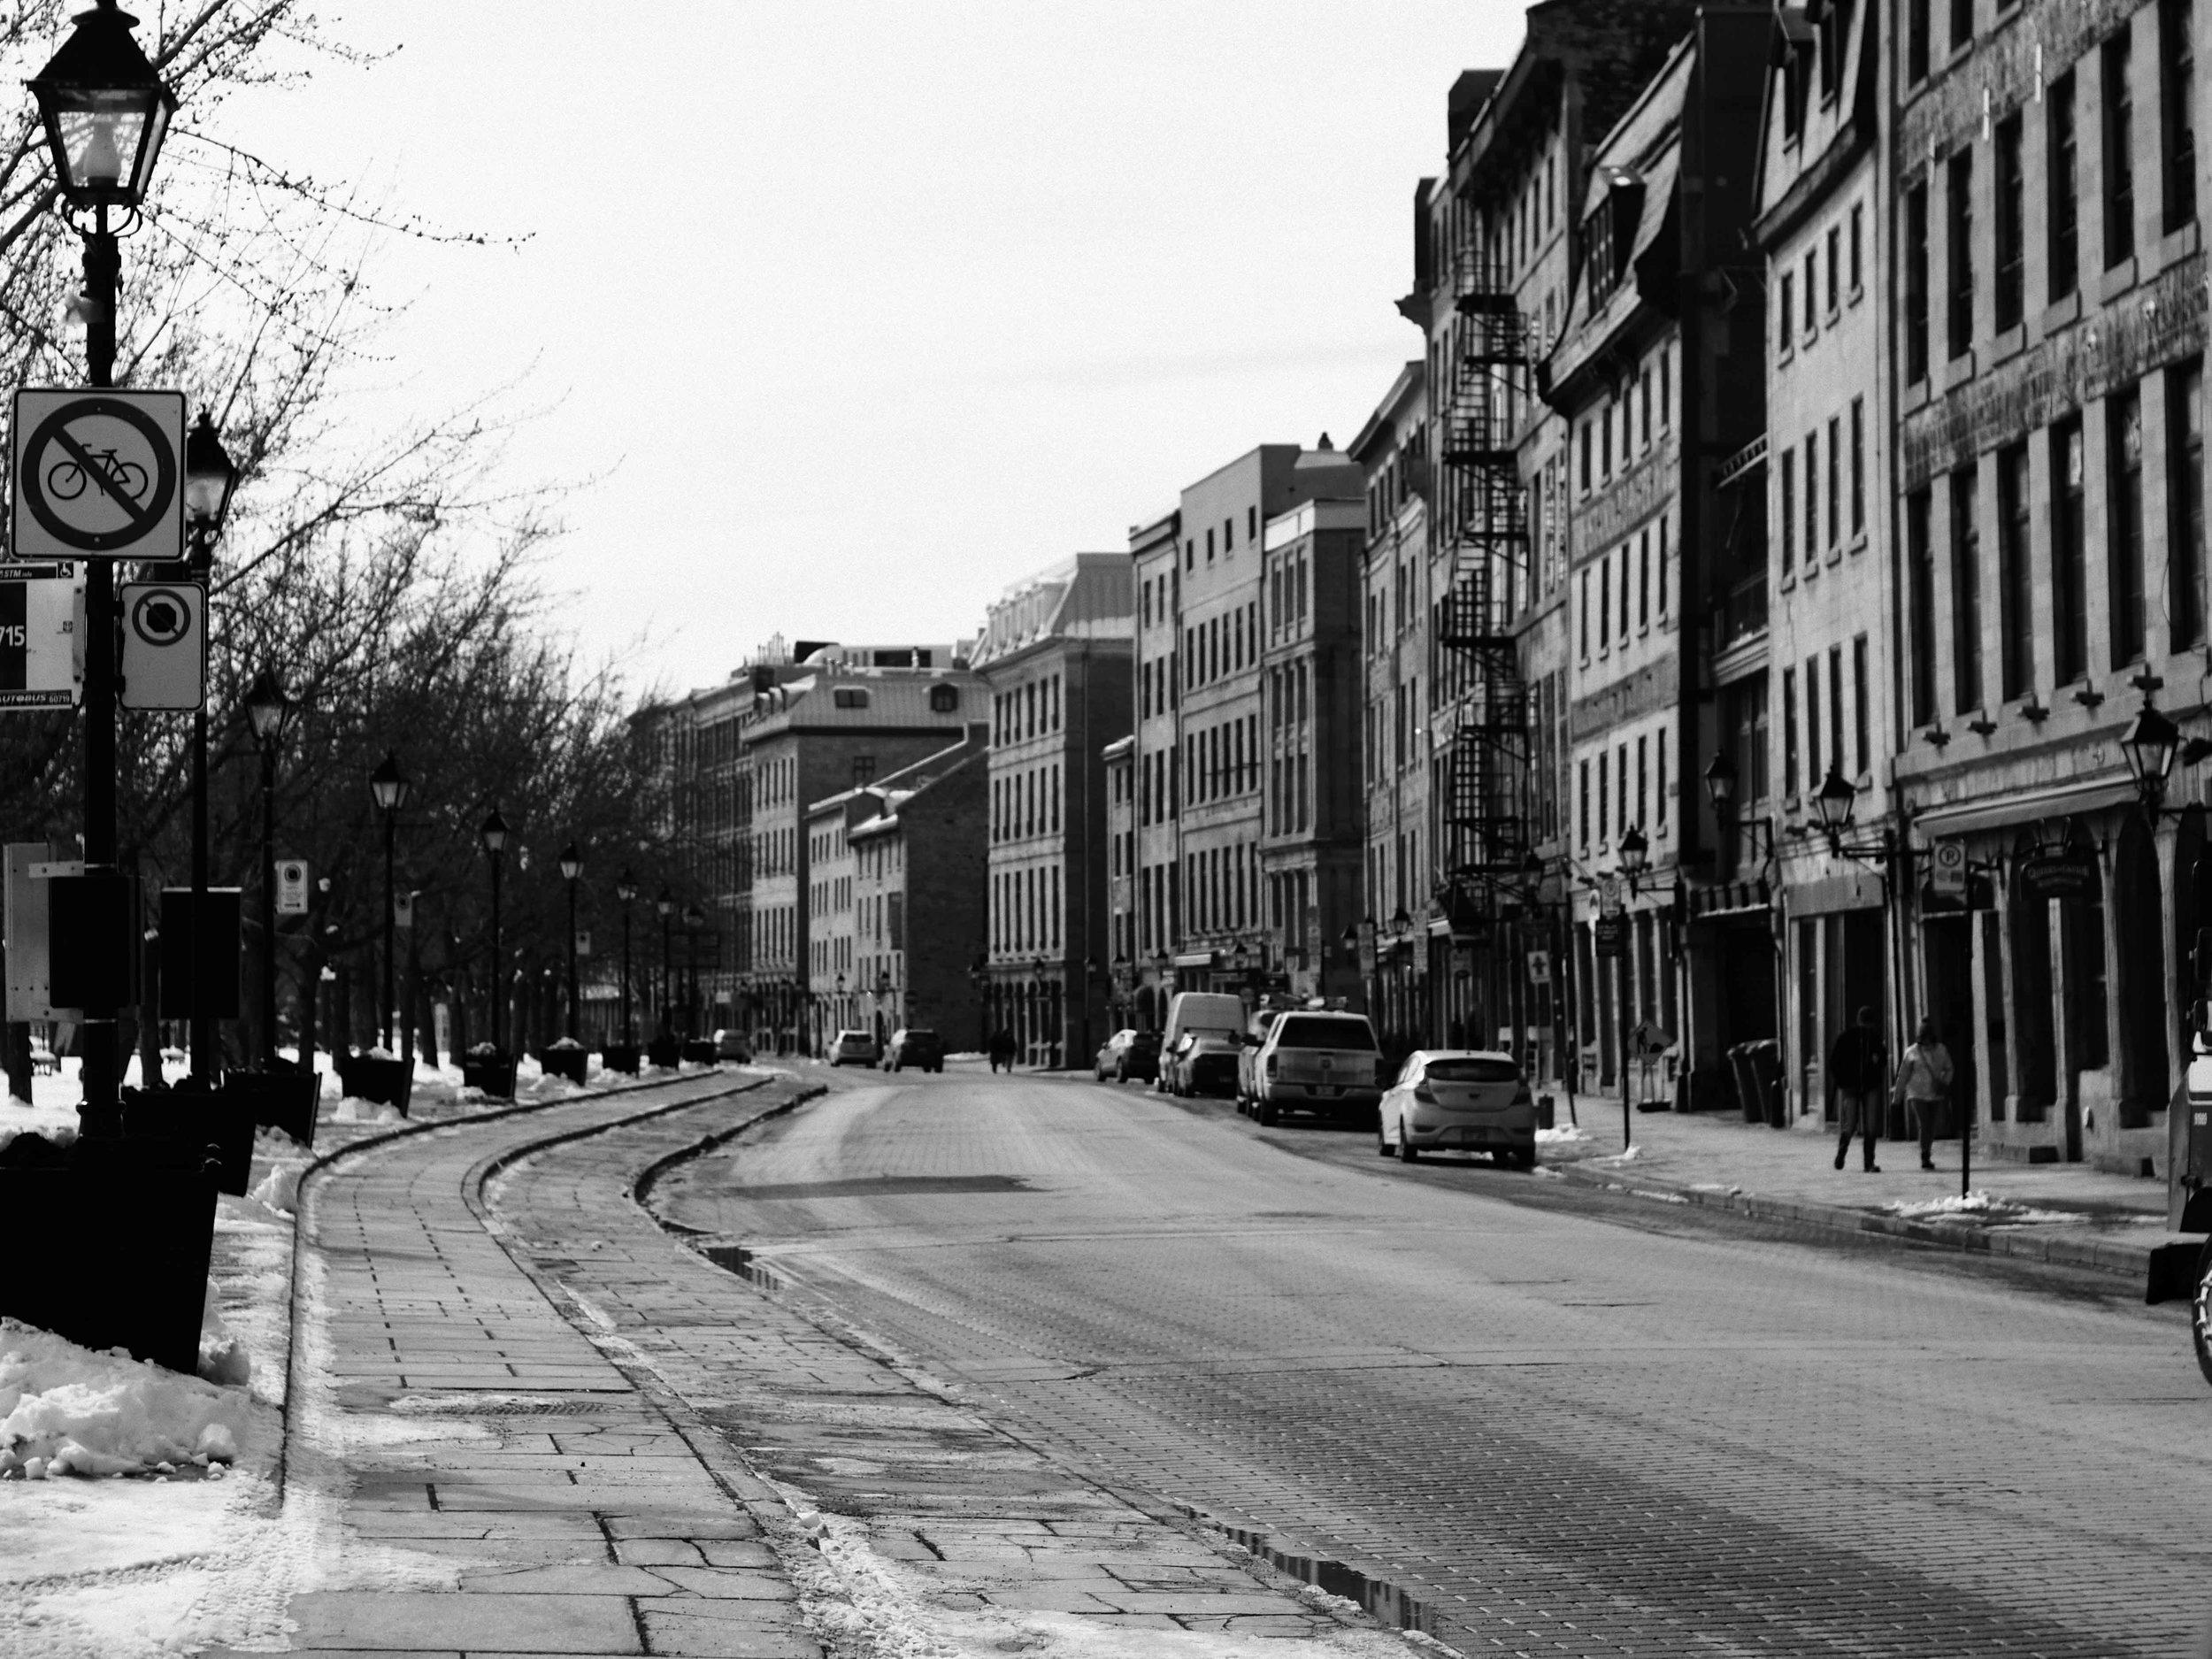 lenoxshotit street photography montreal black and white 2018